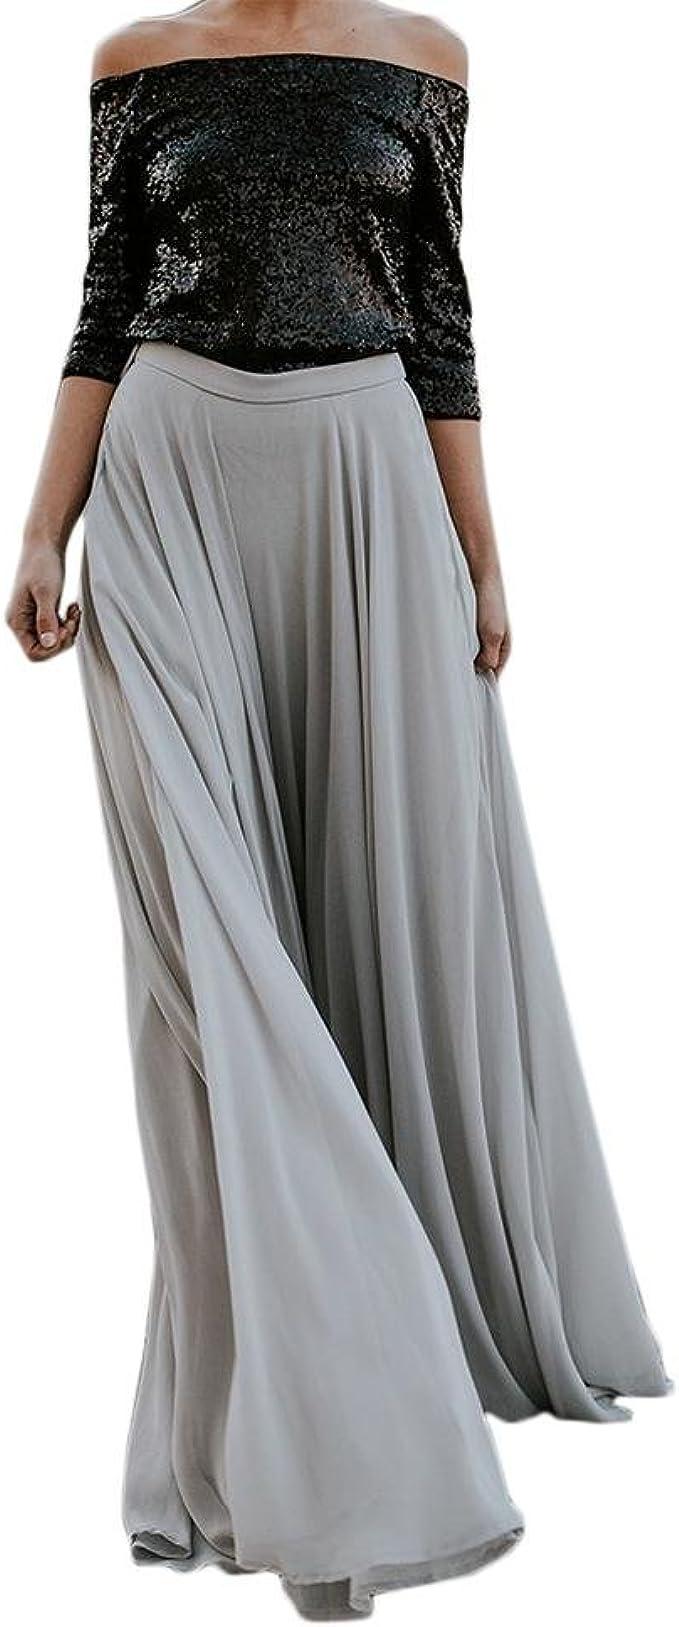 HNTDG Summer Womens Fashion Double Layer Skirt Chiffon Skirt in Solid Color Maxi Skirt Elastic Waist Skirt